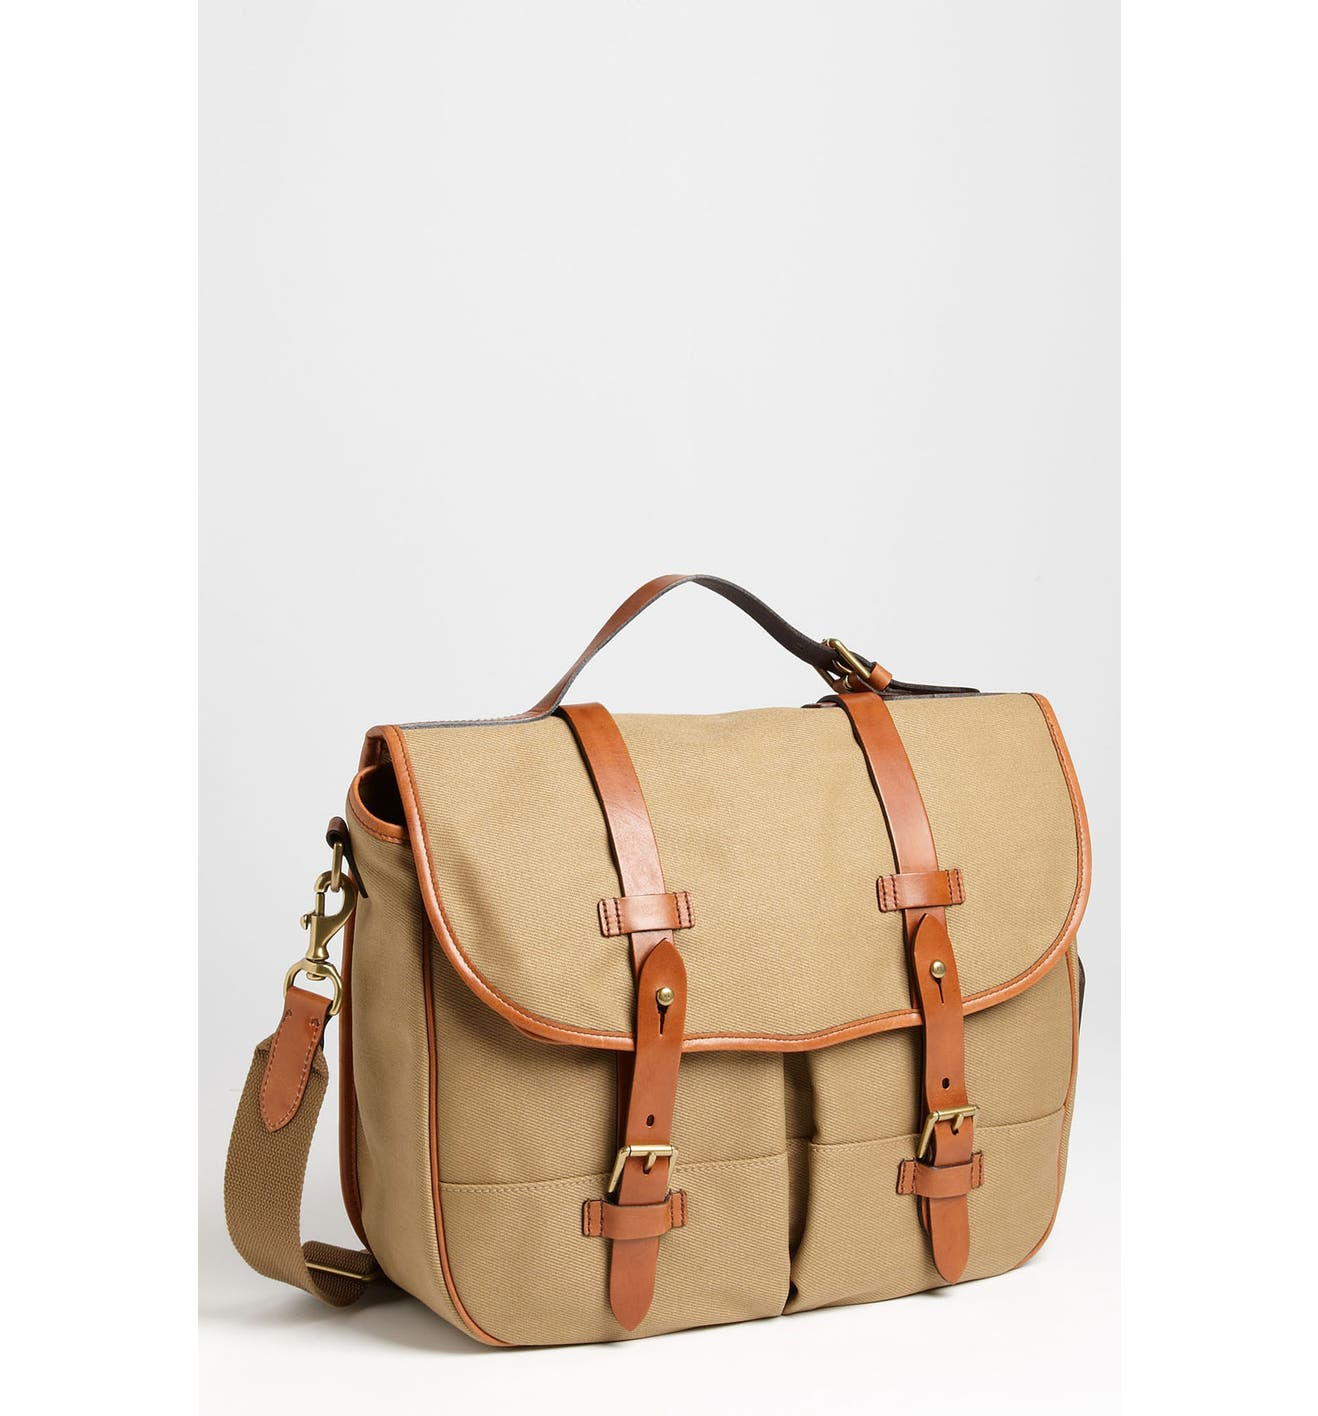 37e529104c56 Polo Ralph Lauren Canvas Messenger Bag